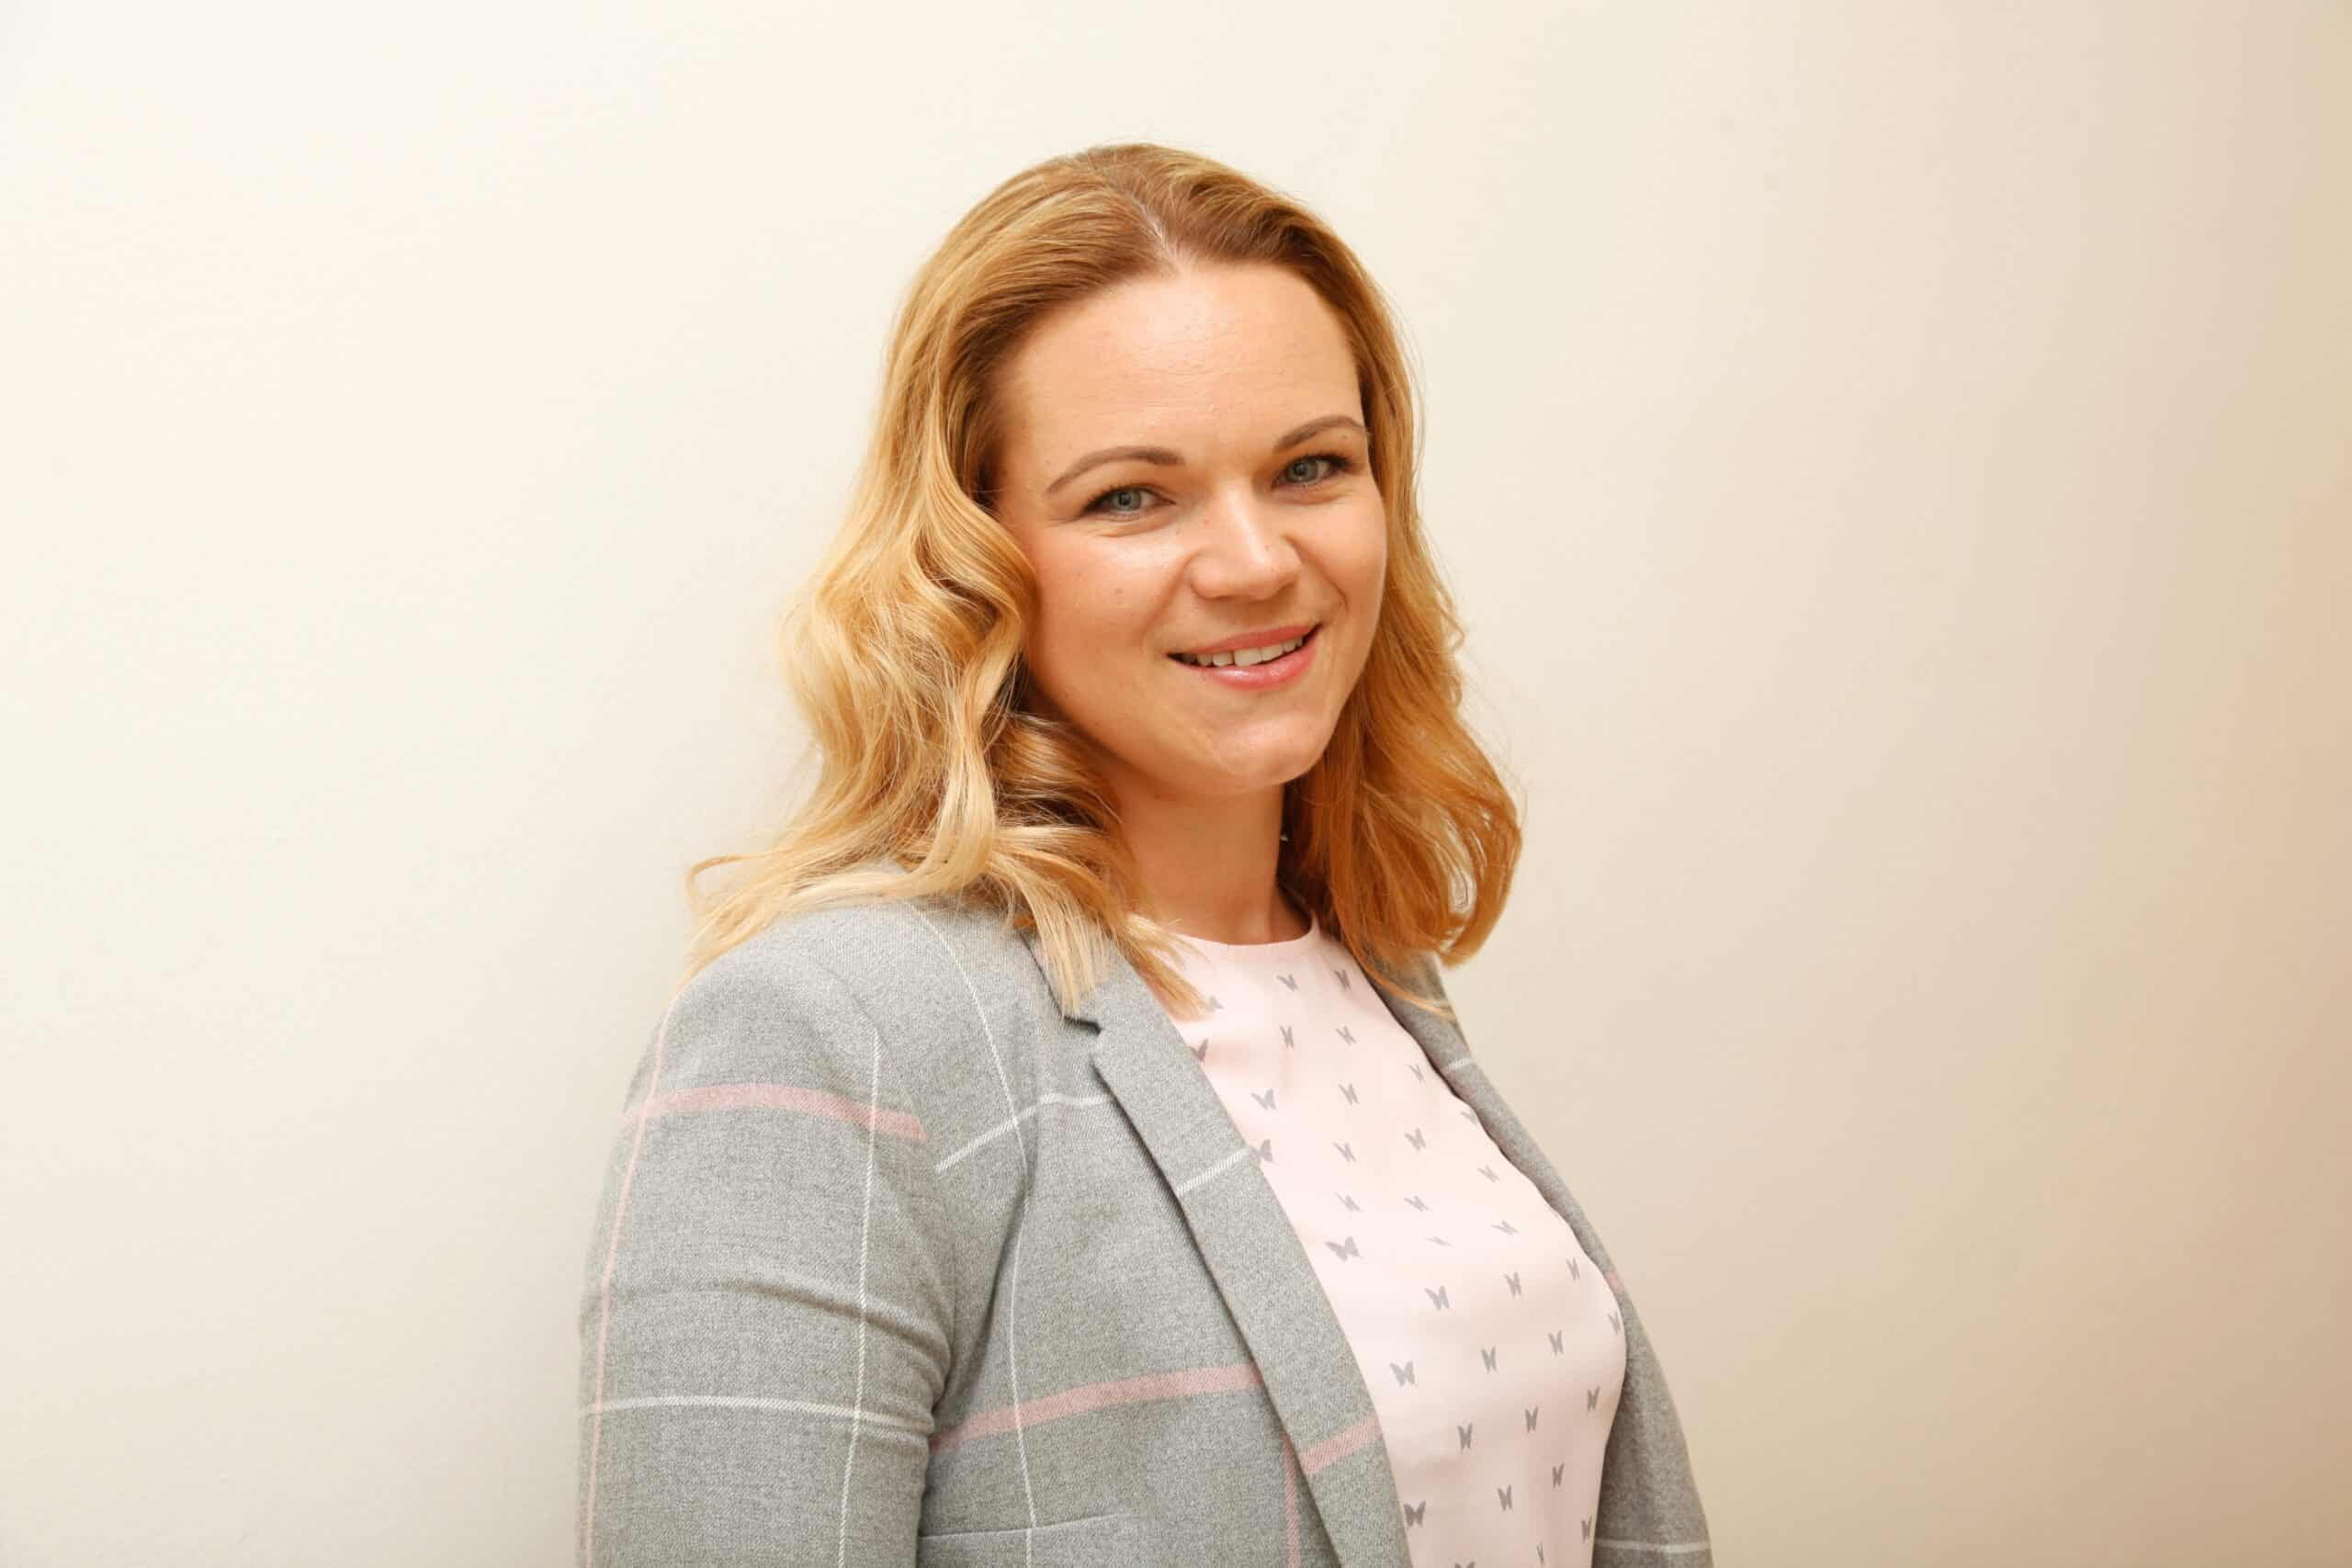 Dyrektor Justyna Kamińska-Żak